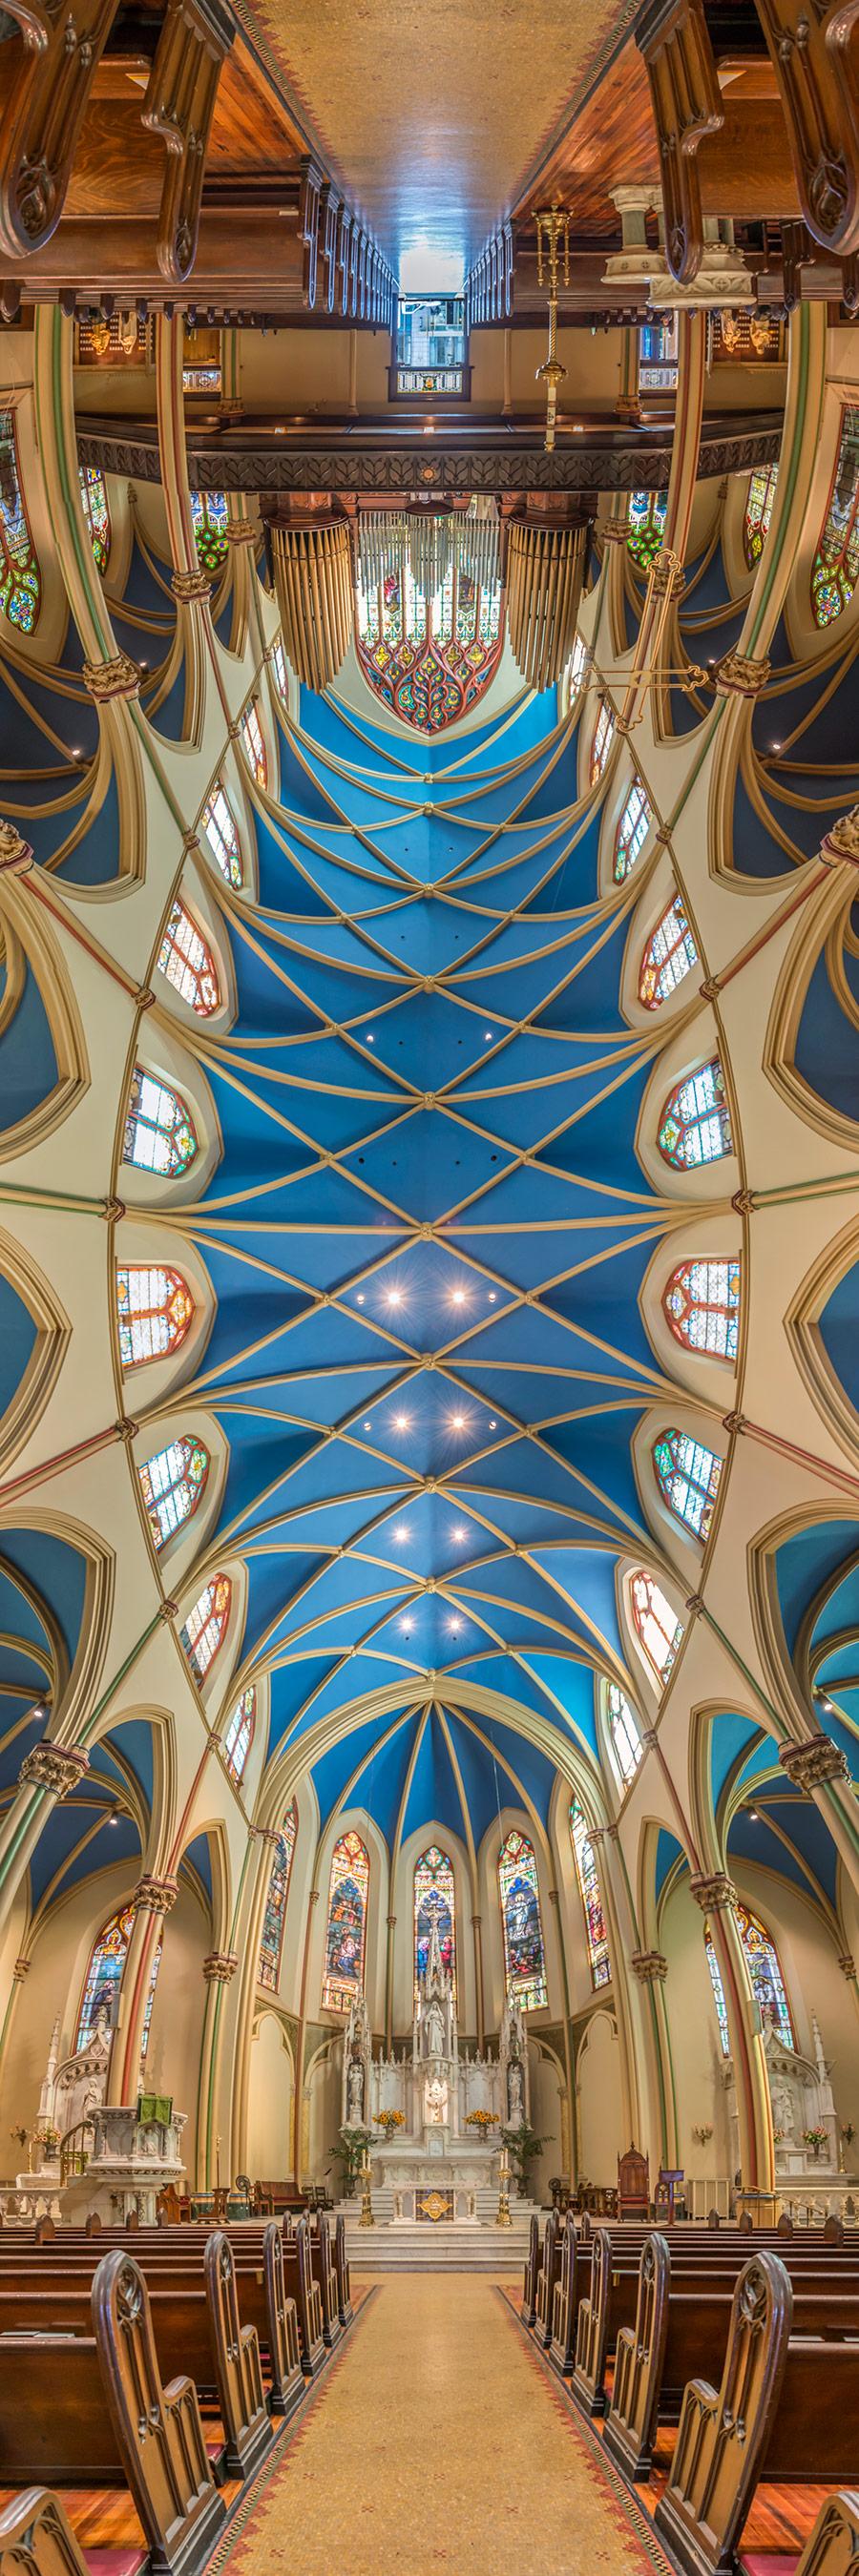 chiese-new-york-interno-foto-panoramiche-verticali-richard-silver-4